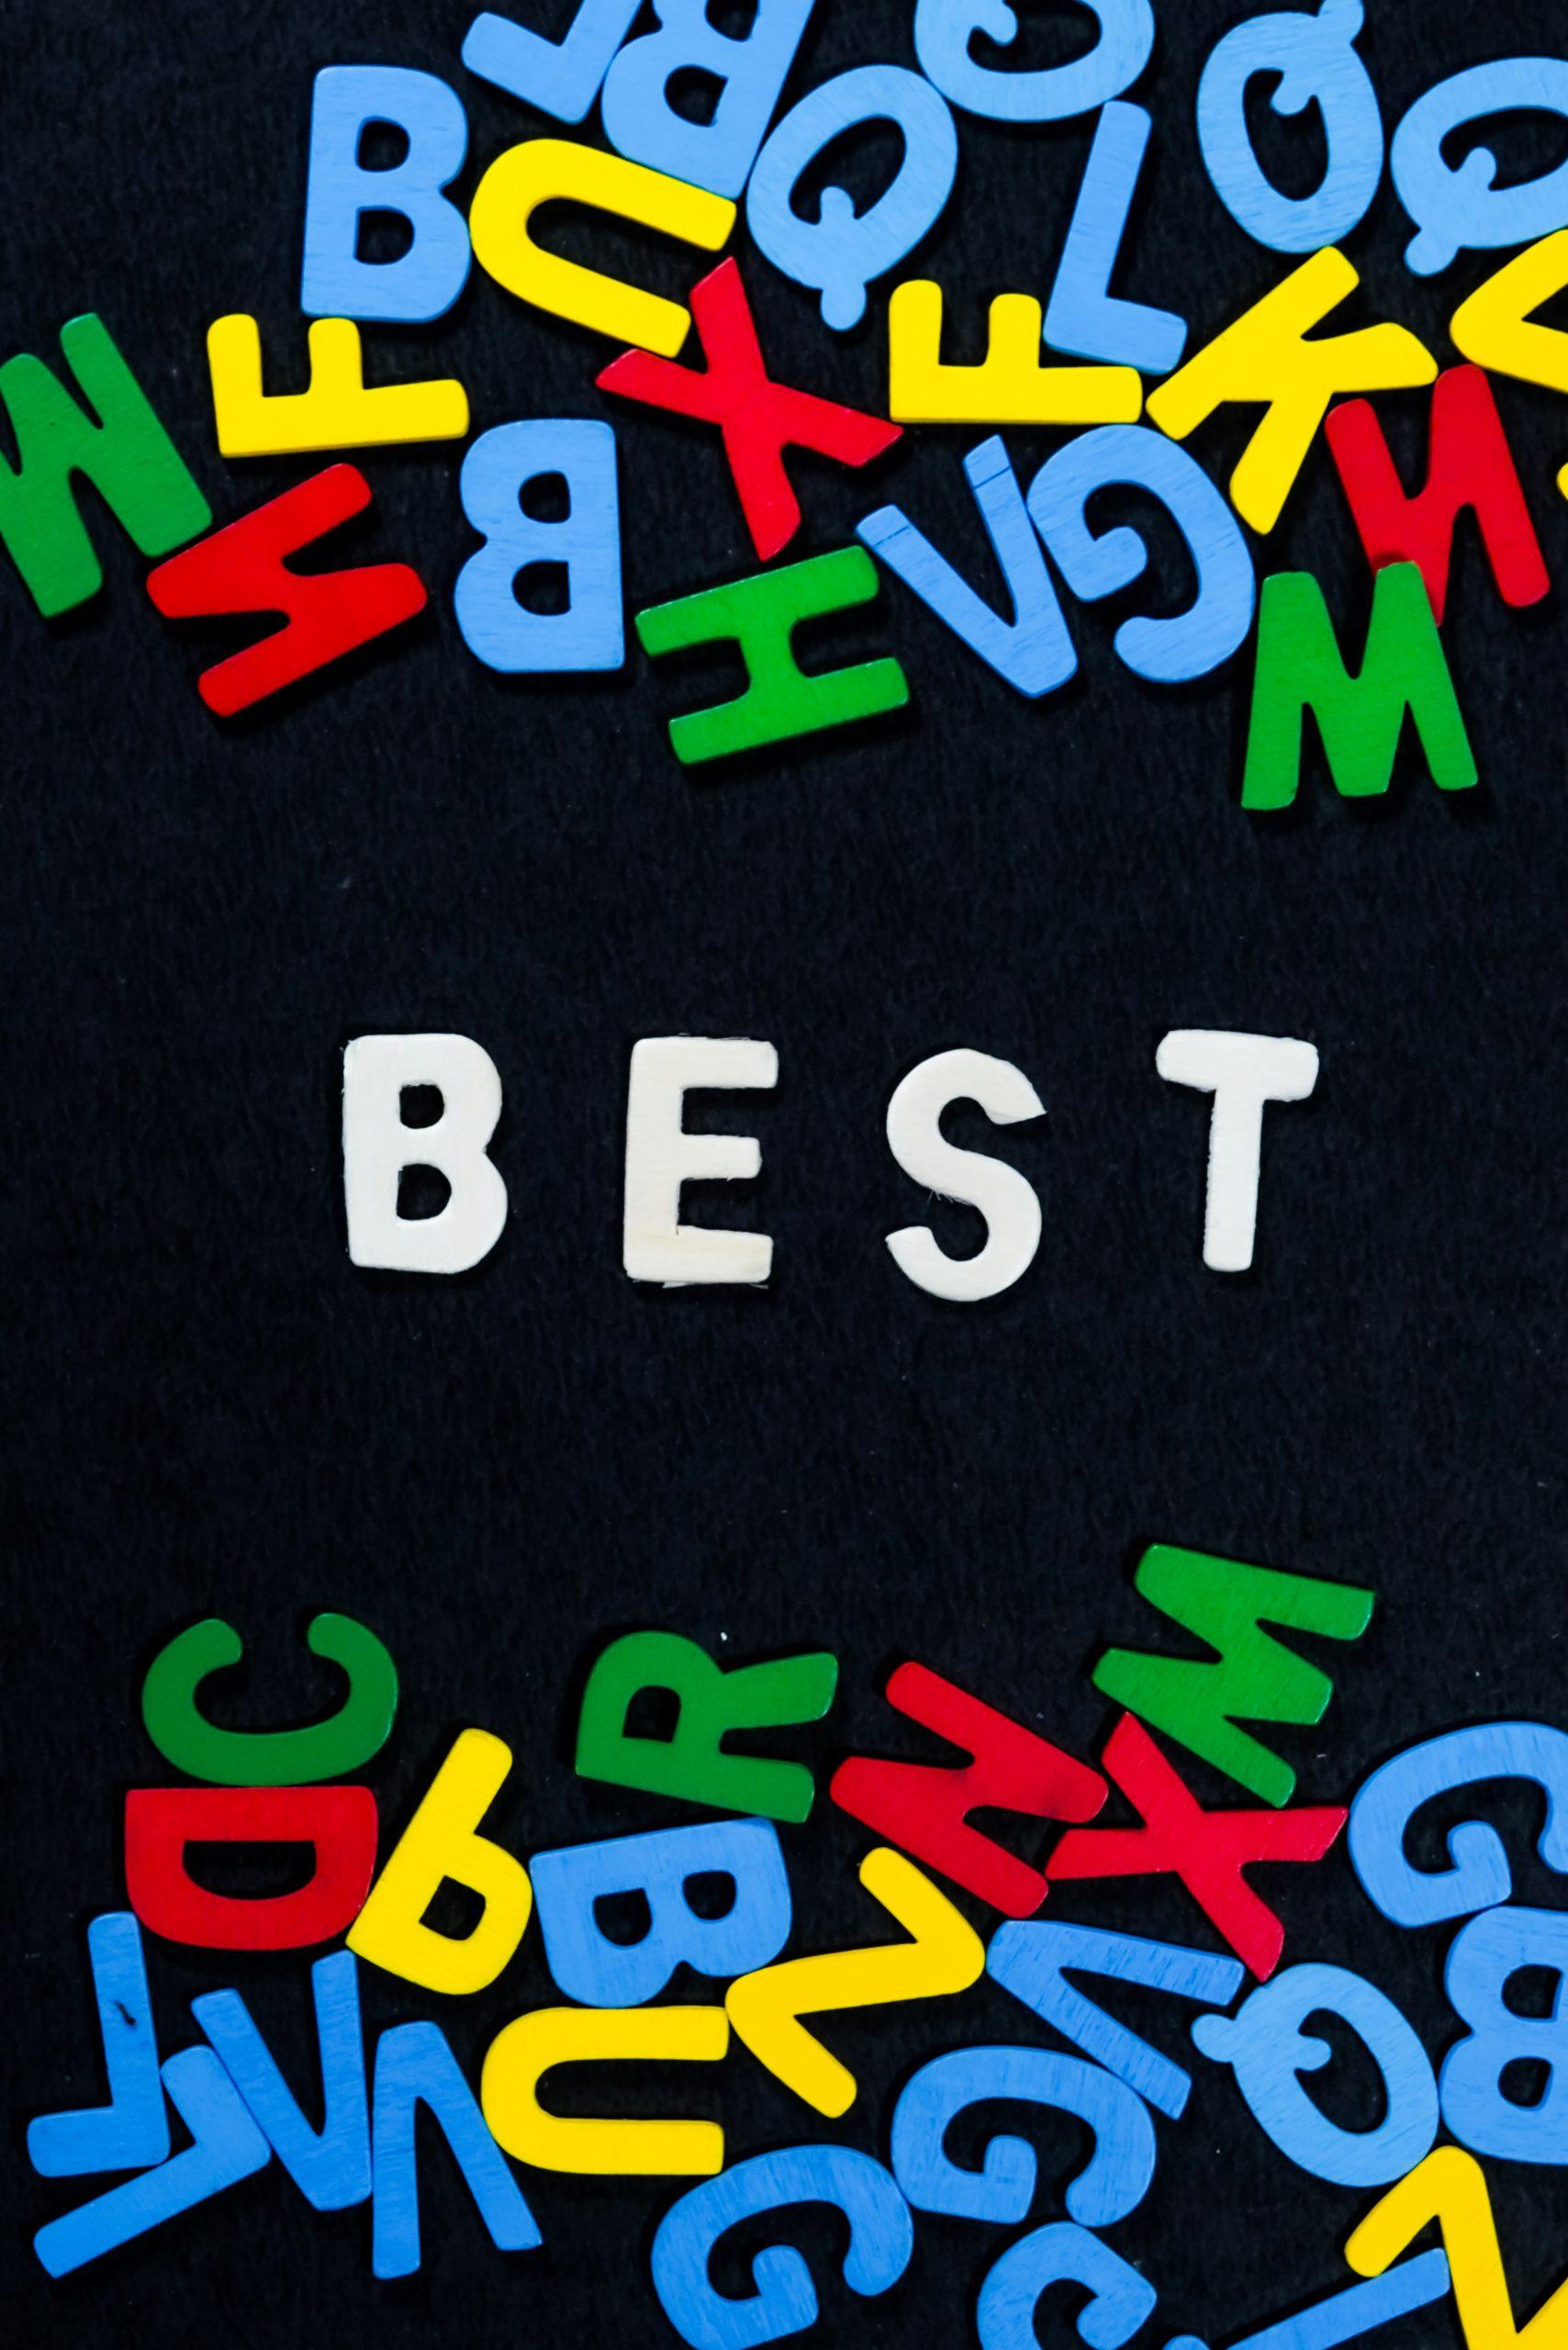 Best things happen to everyone